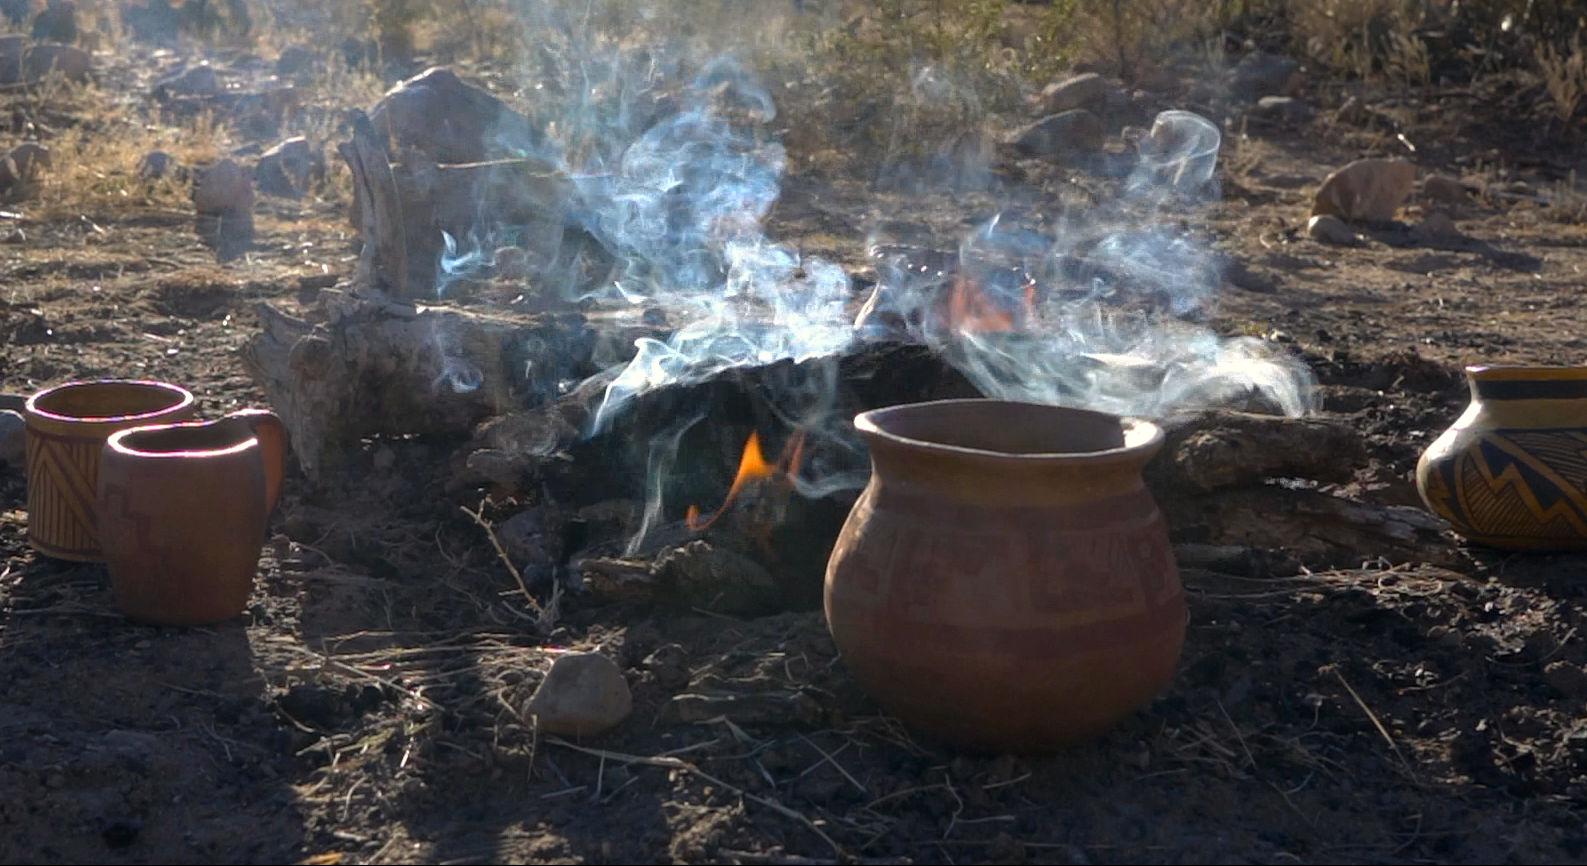 Pottery Firing Feb. 6, 2021